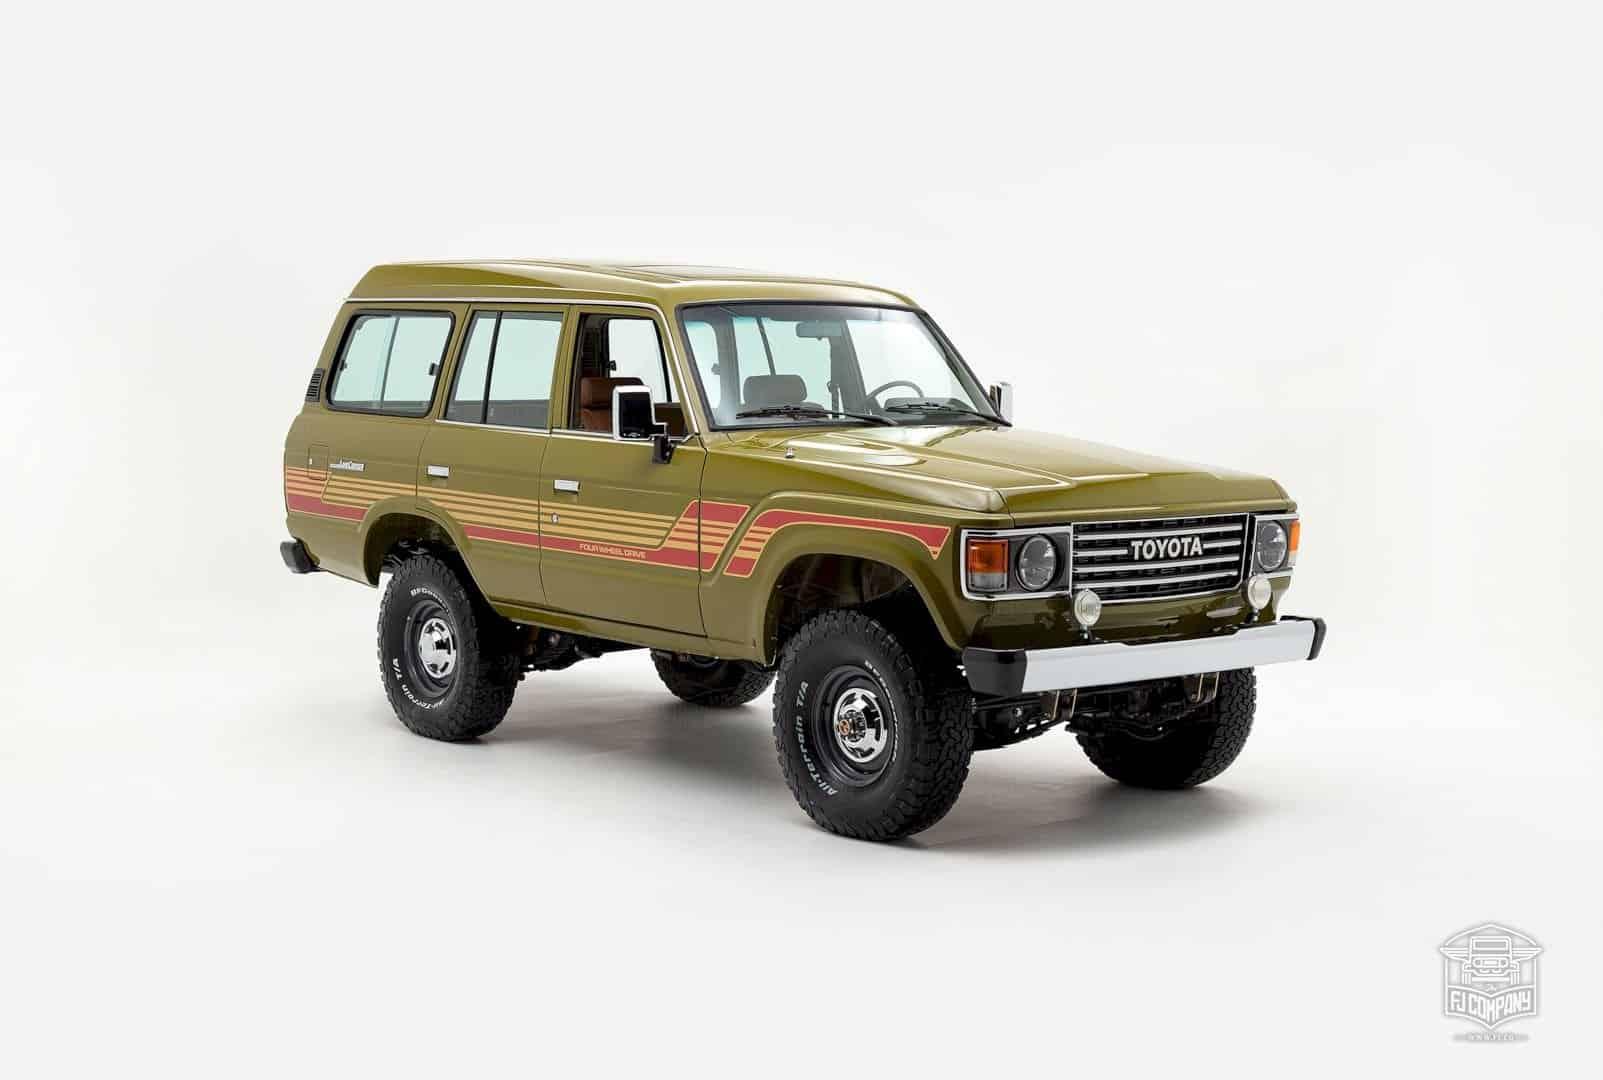 1986 Toyota Land Cruiser Fj62 Olive 9